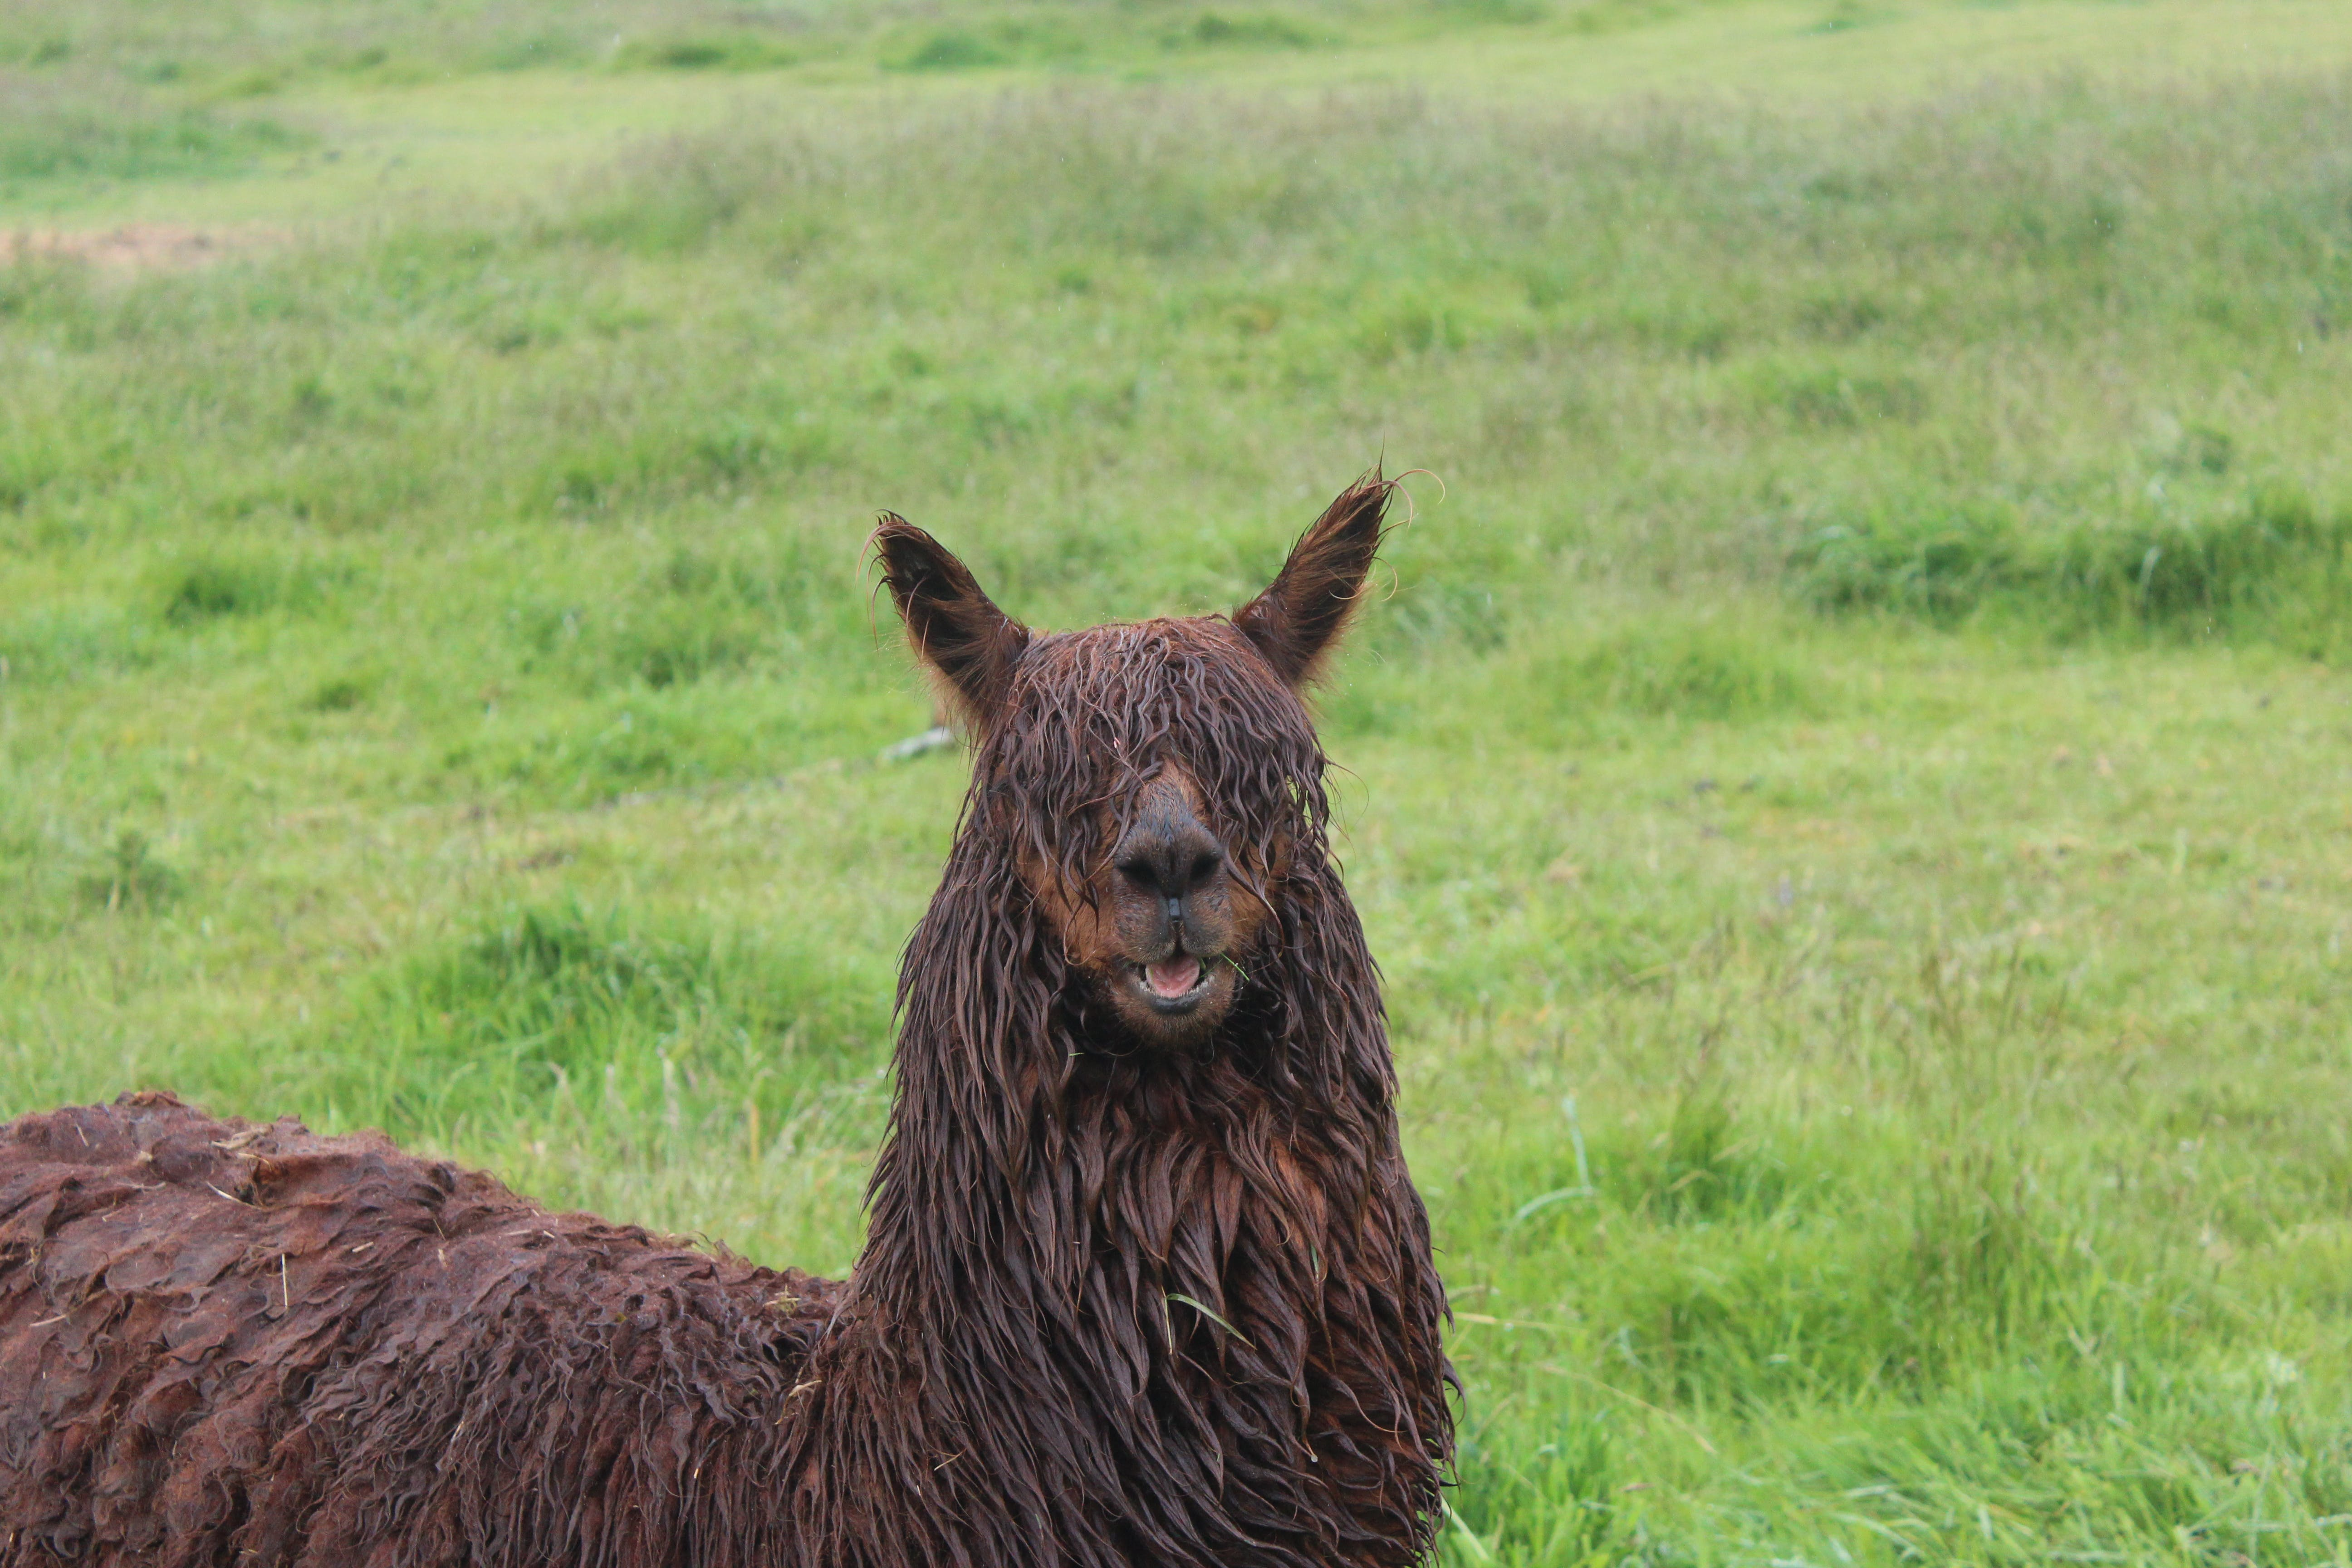 dyrefotografering, dyreportræt, lama